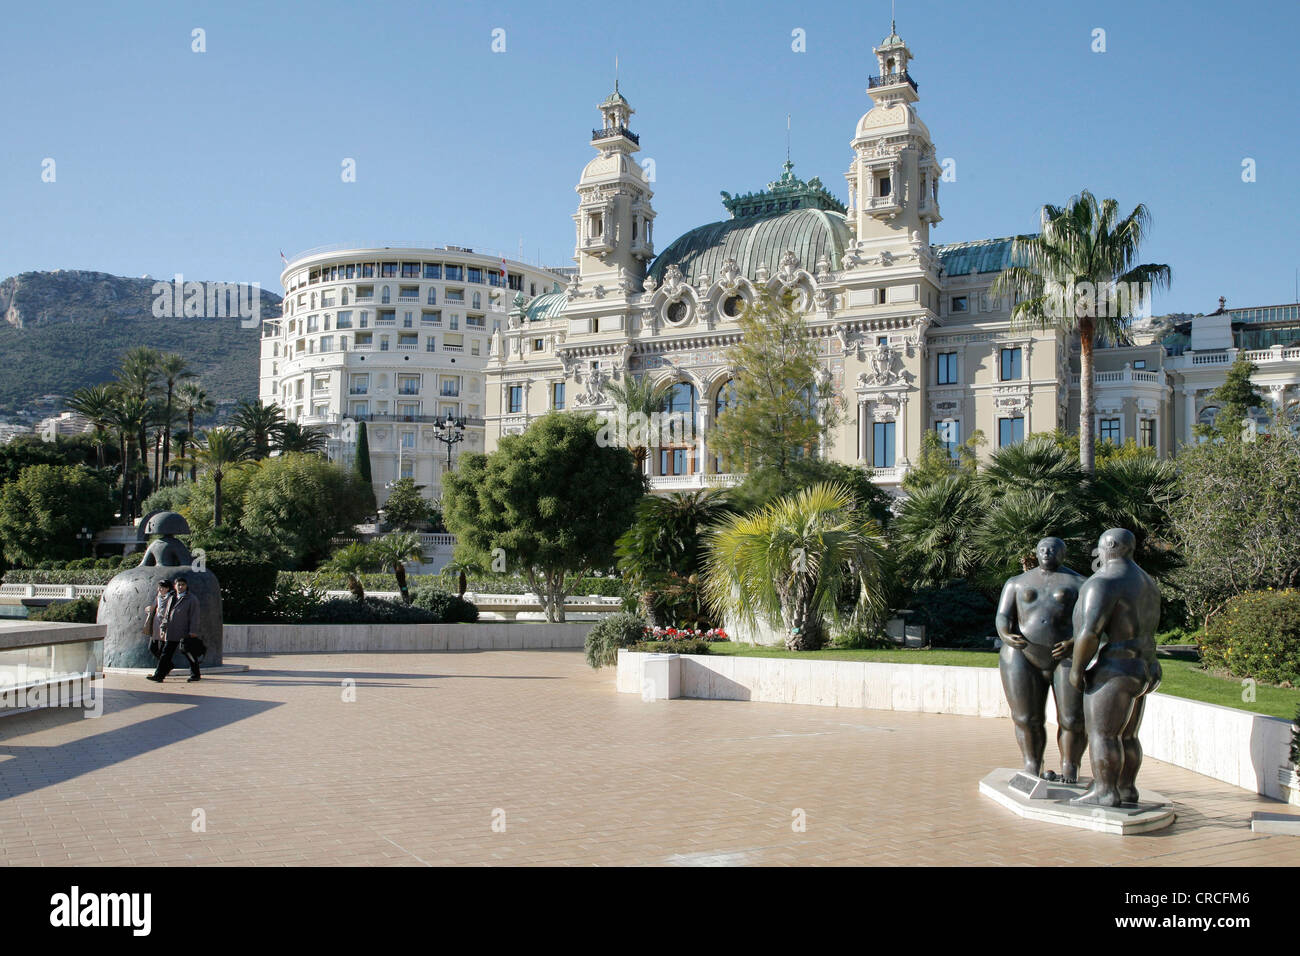 Opera, Salle Garnier, Hotel de Paris on the left, Monte Carlo, Principality of Monaco, Europe - Stock Image